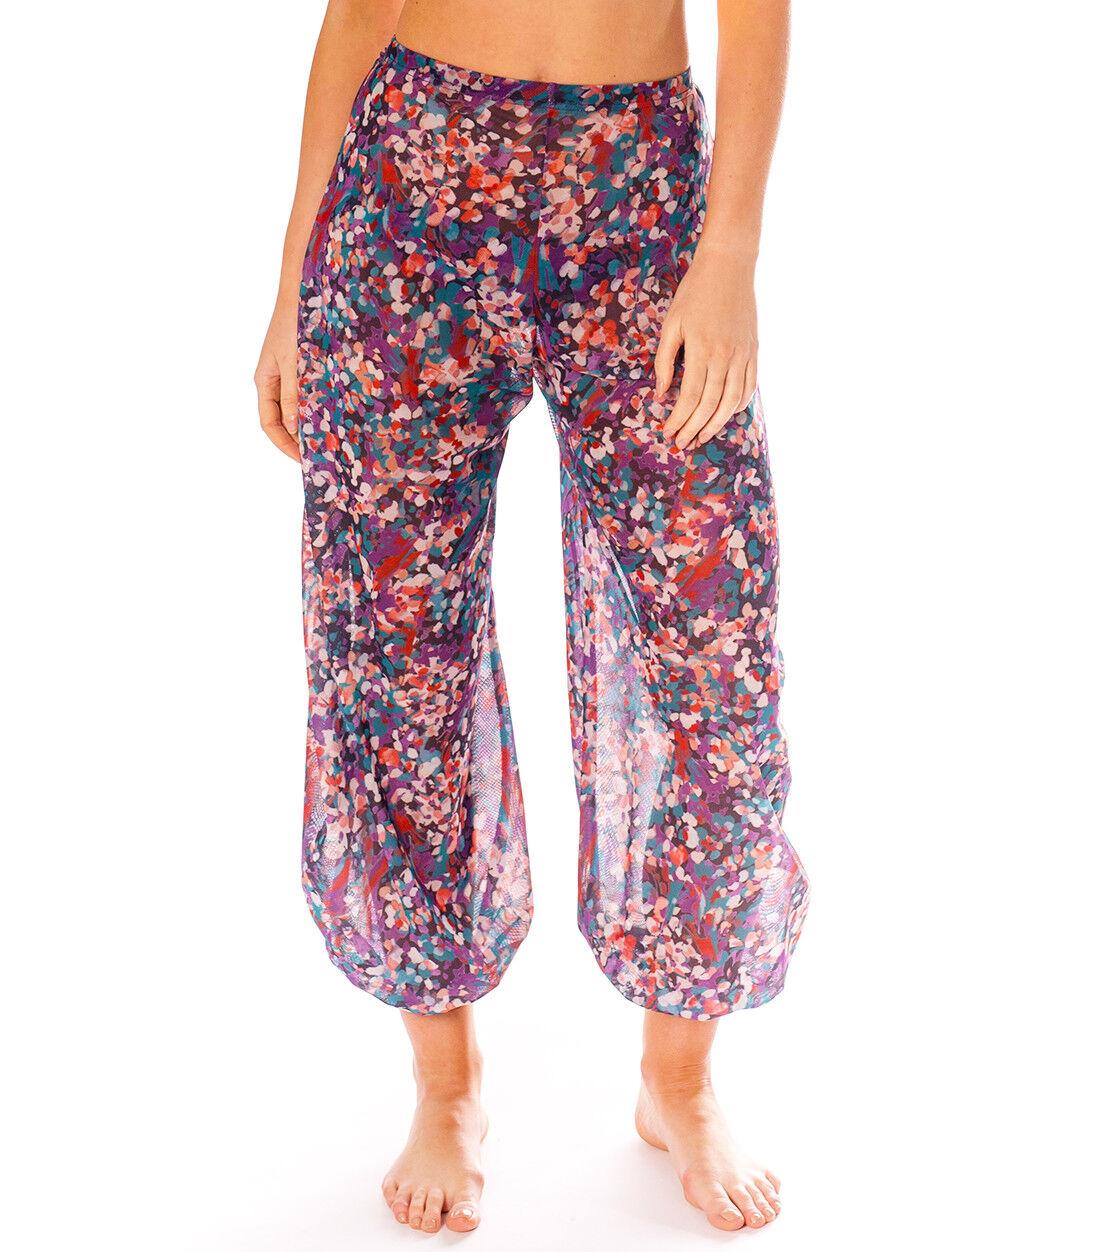 Kiniki Elba Tan Through Harem Trousers Accessory Beachwear Made in England